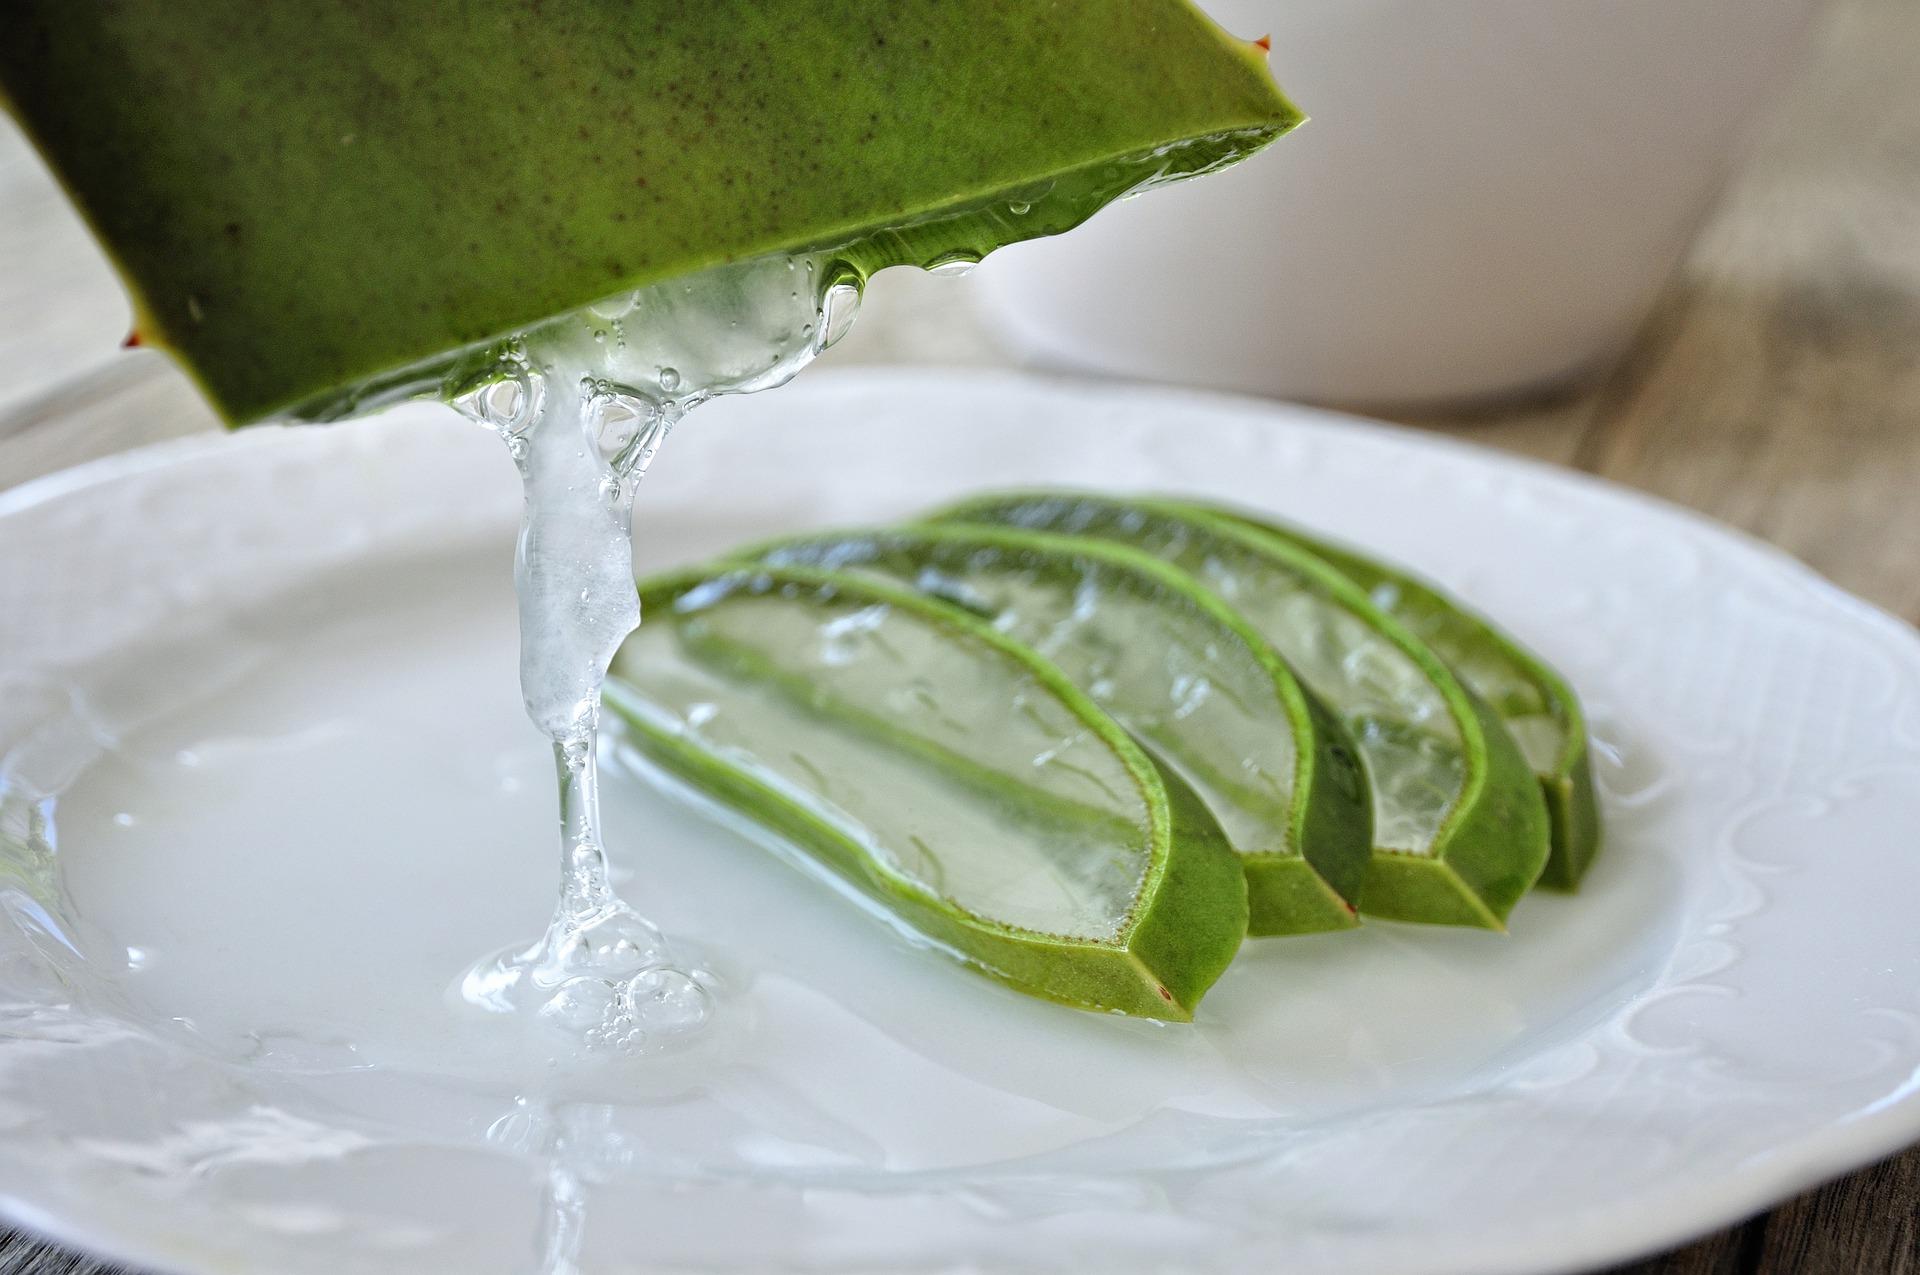 squarerooms-aloe-vera-plant-fresh-gel-squeeze-plate